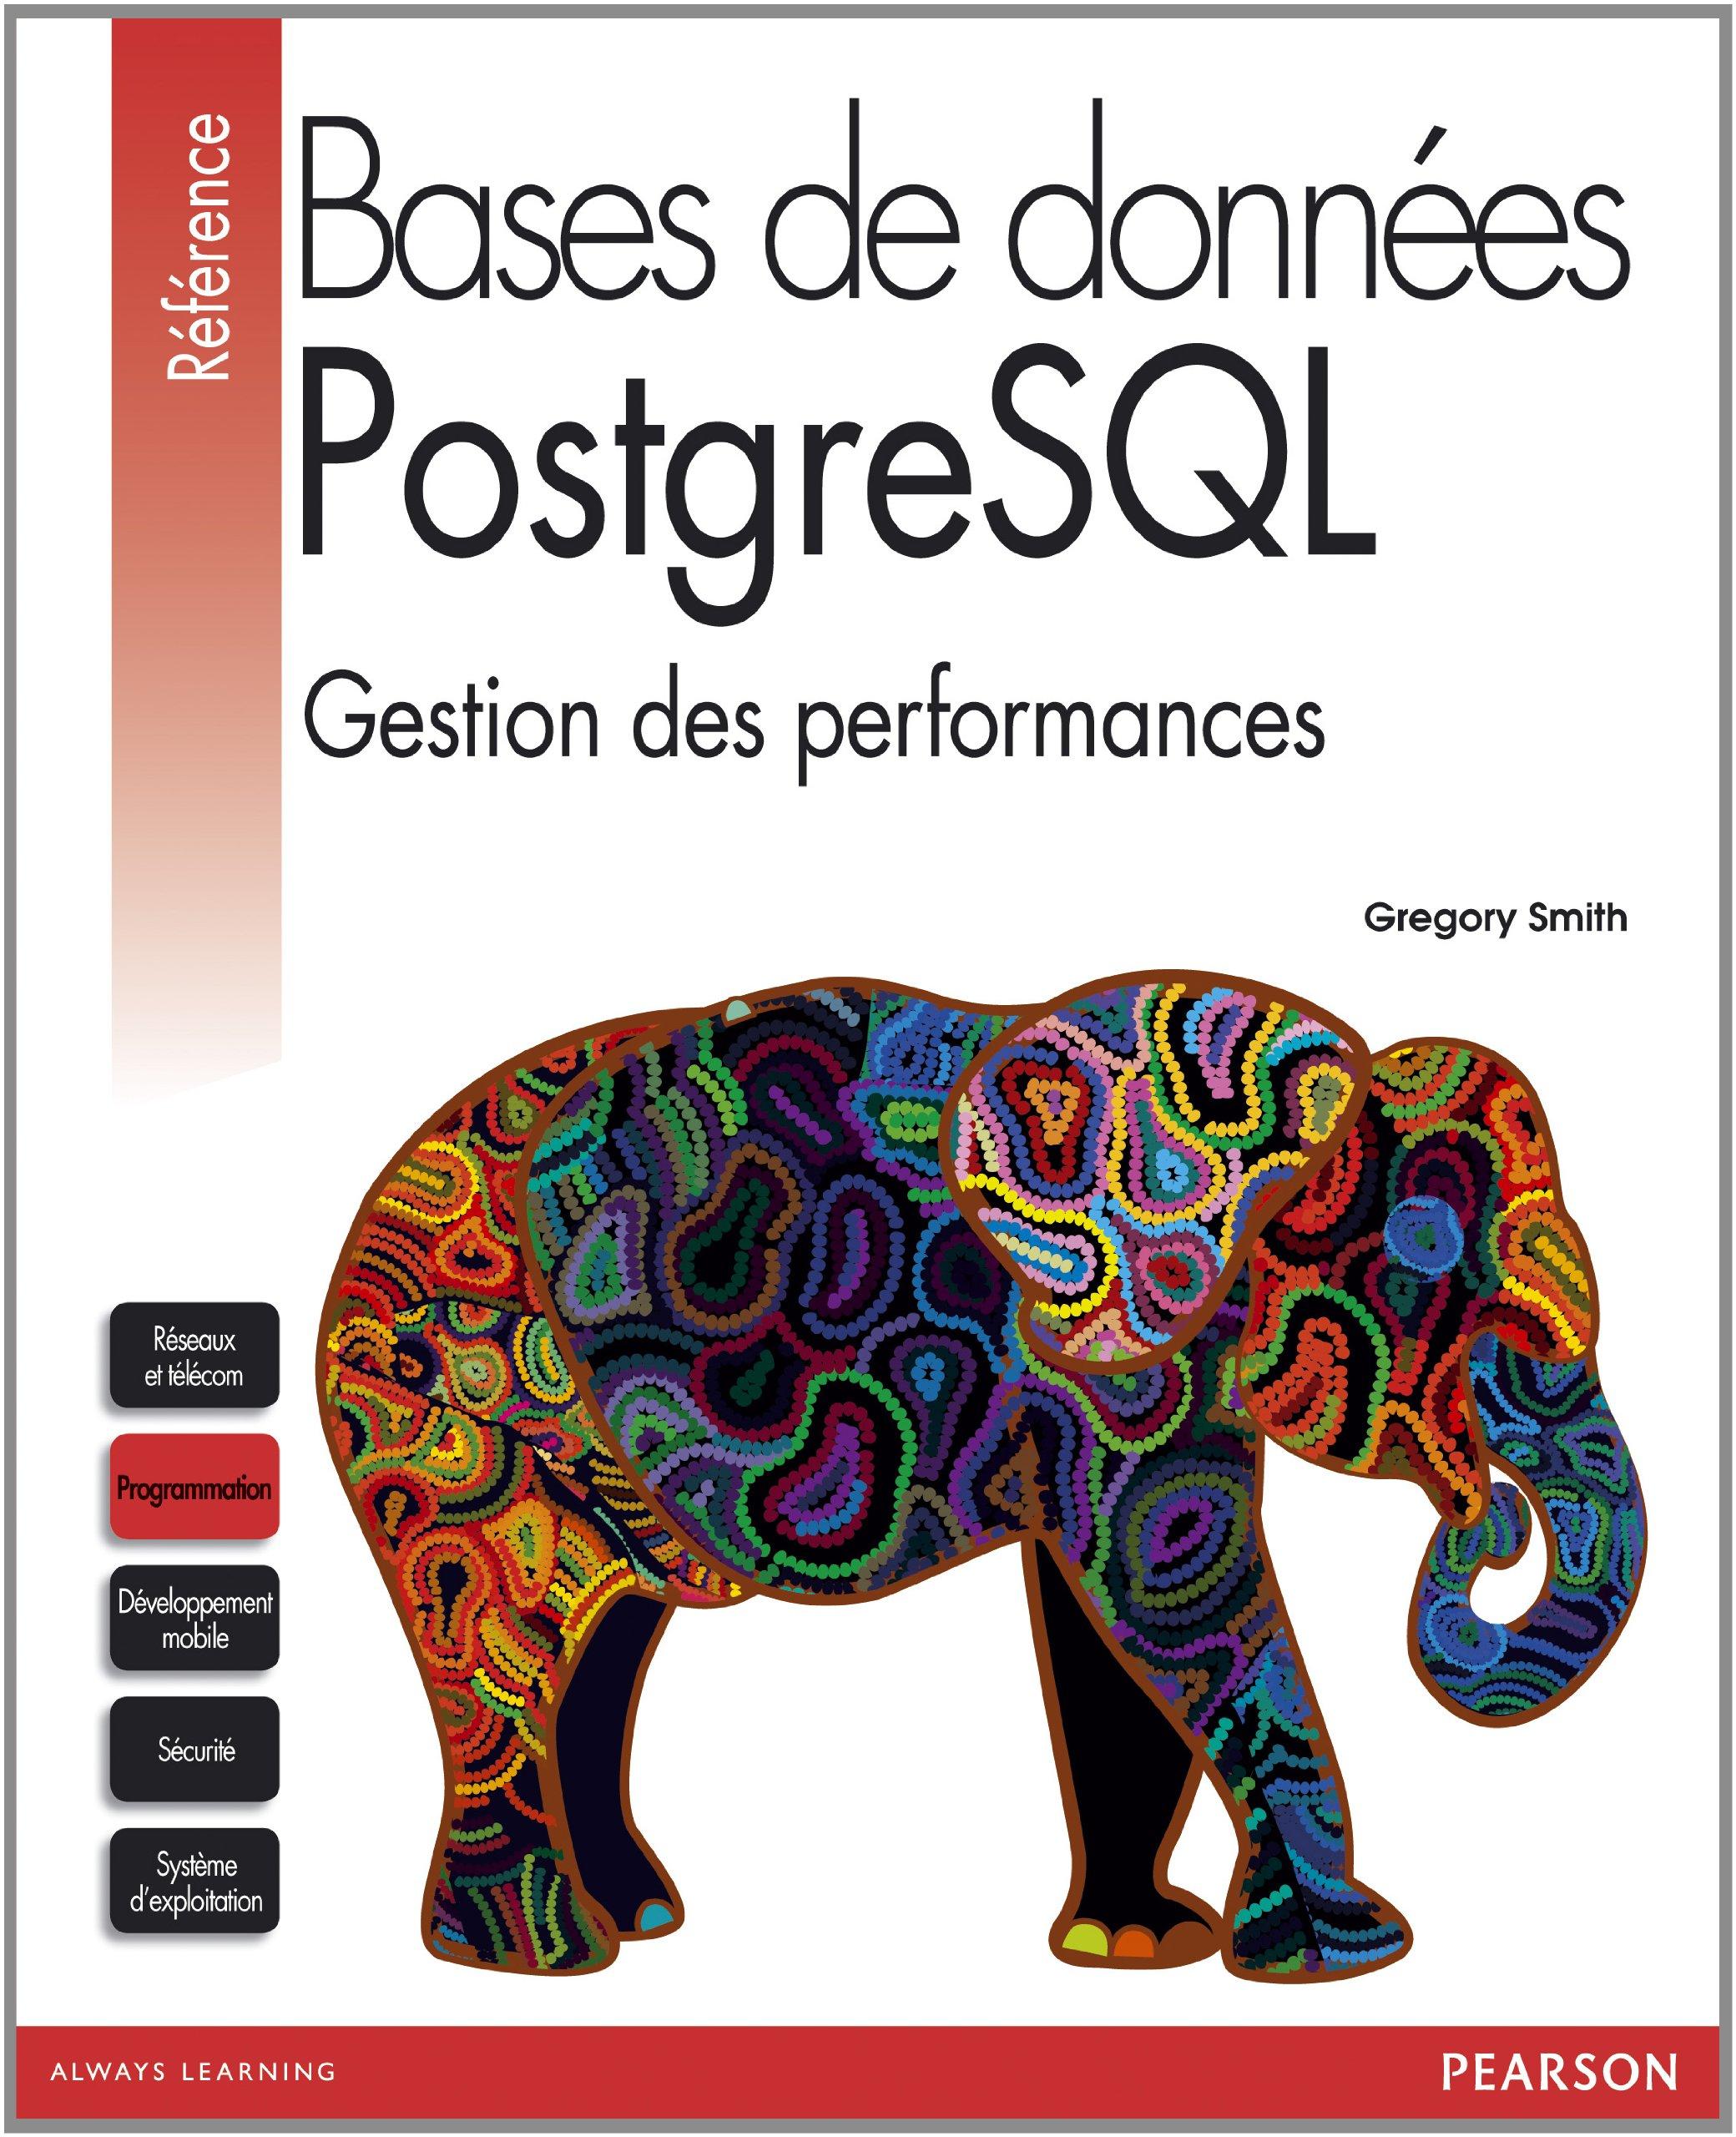 Bases de données PostgreSQL 9.0 Broché – 26 mai 2011 Gregory Smith Pearson 274402483X Informatique